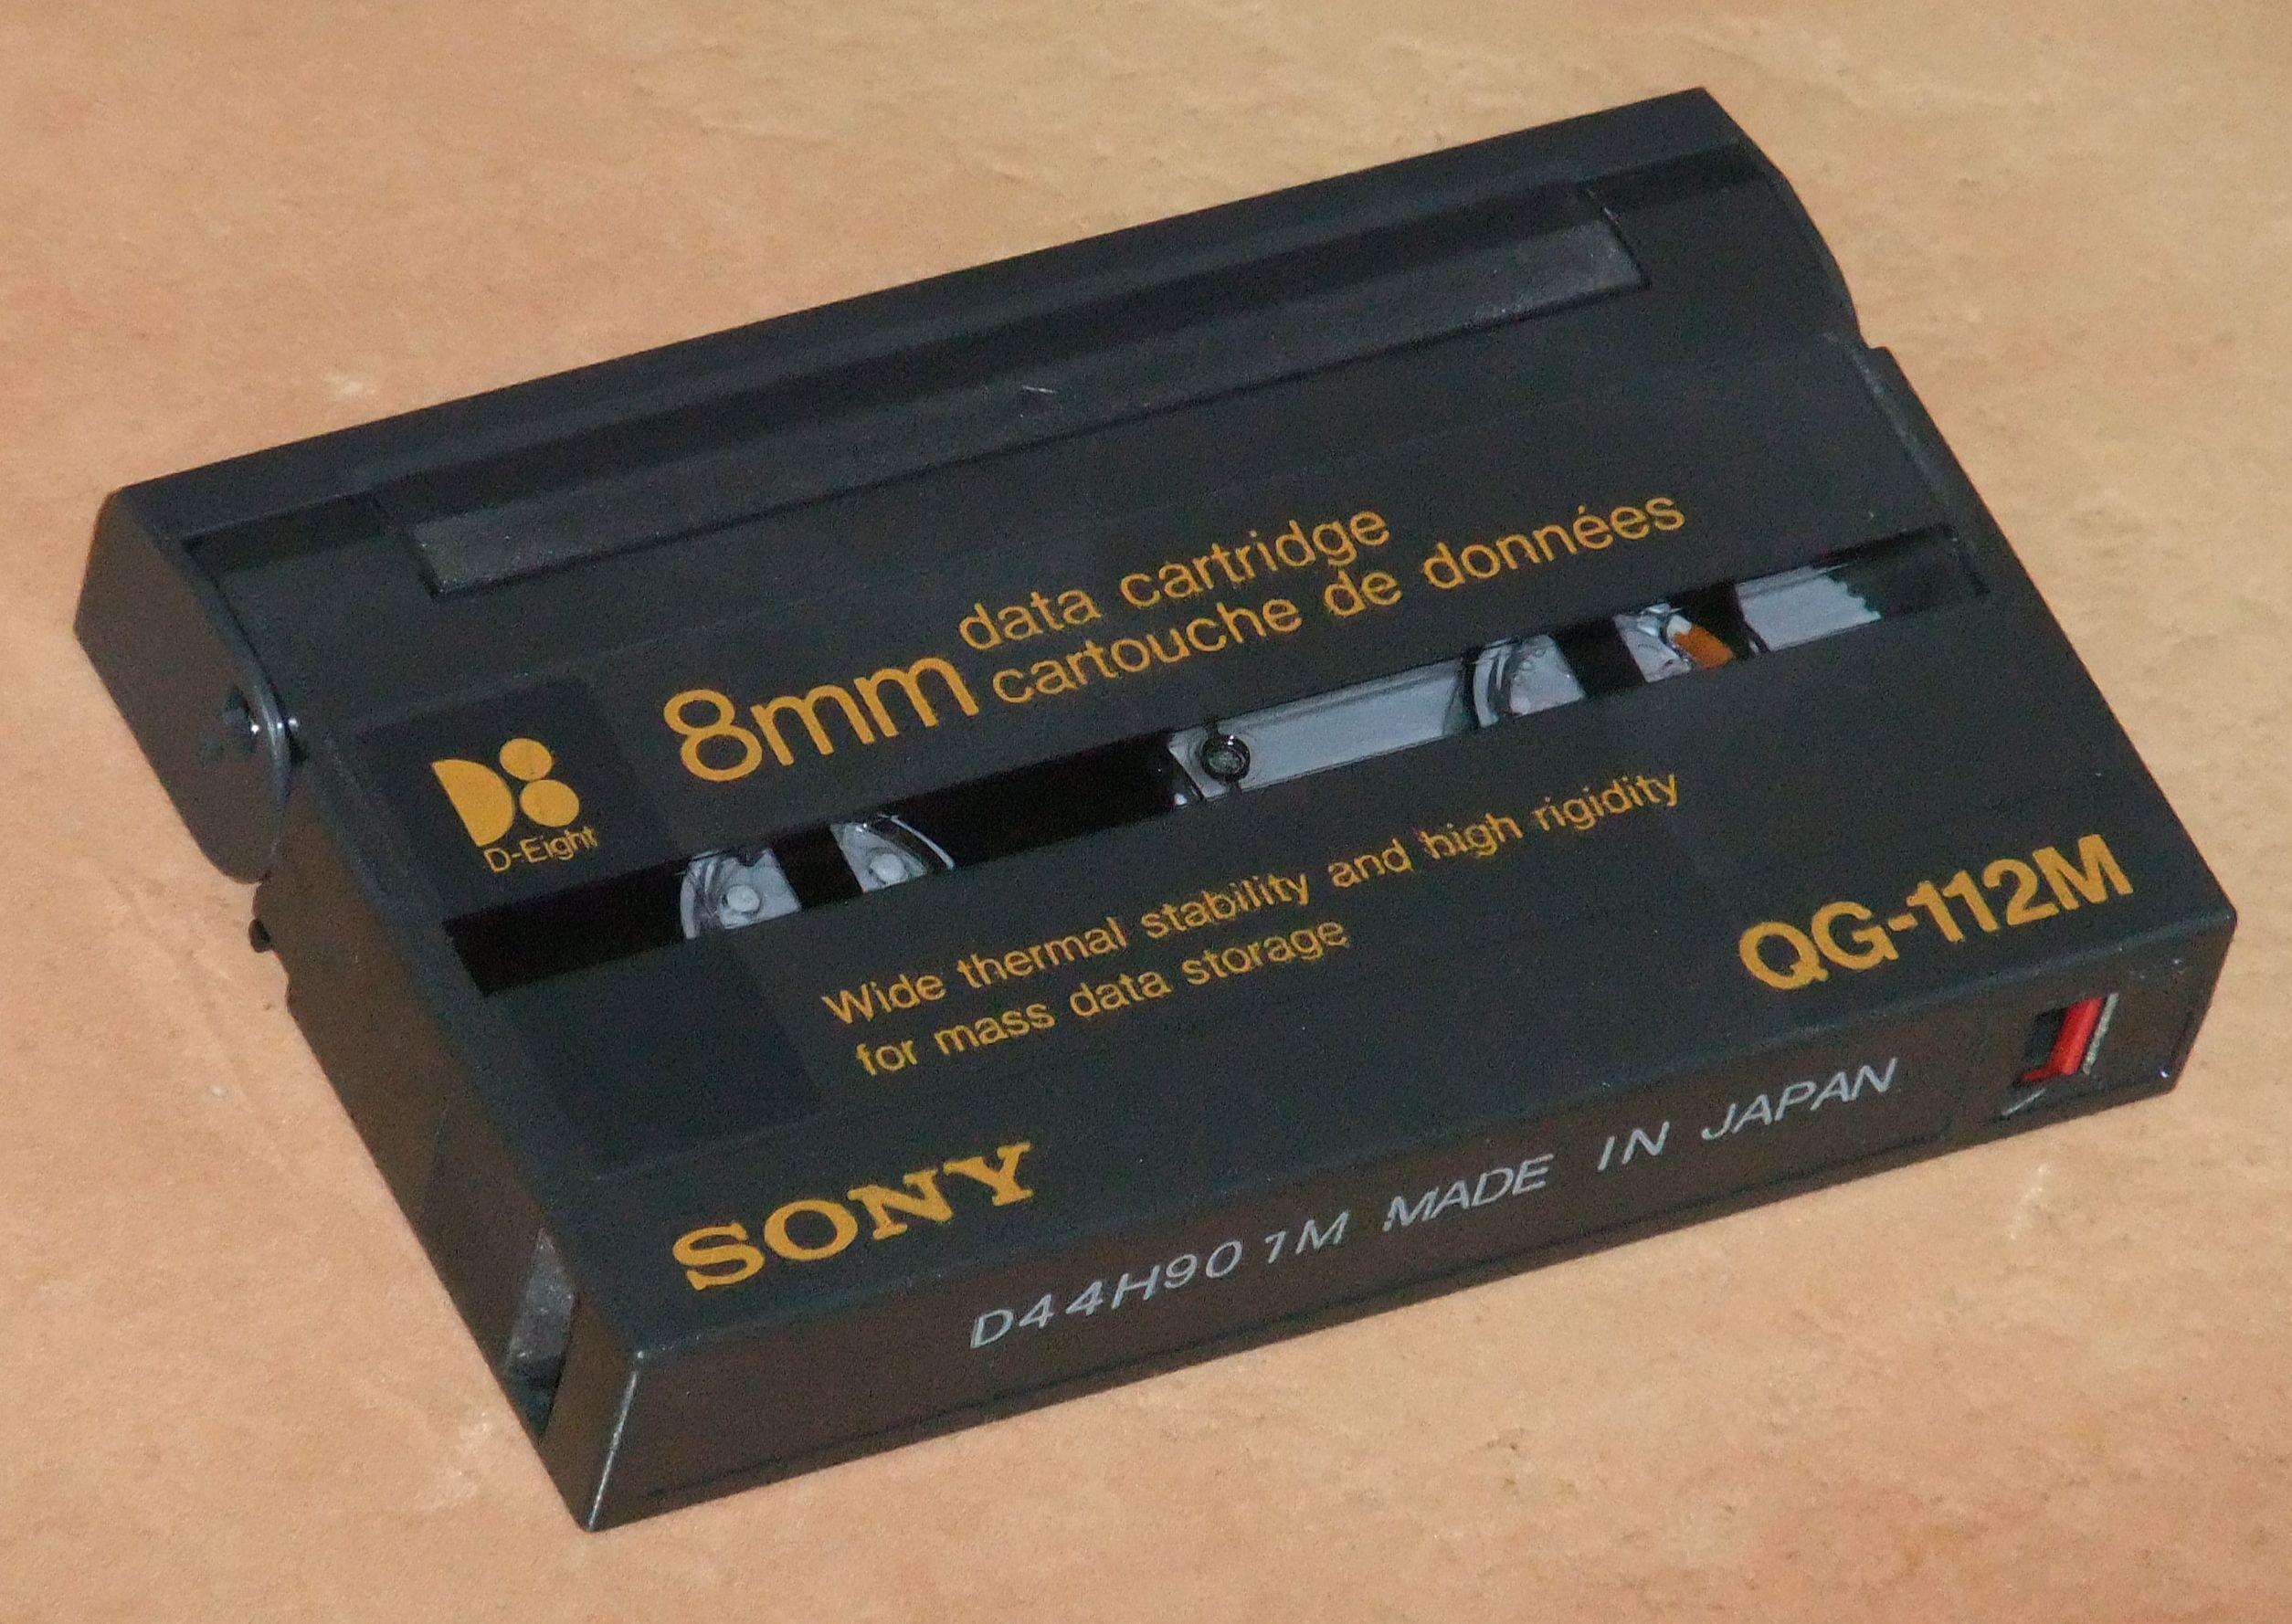 File A Sony Data8 Cartridge 112m Jpg Wikipedia